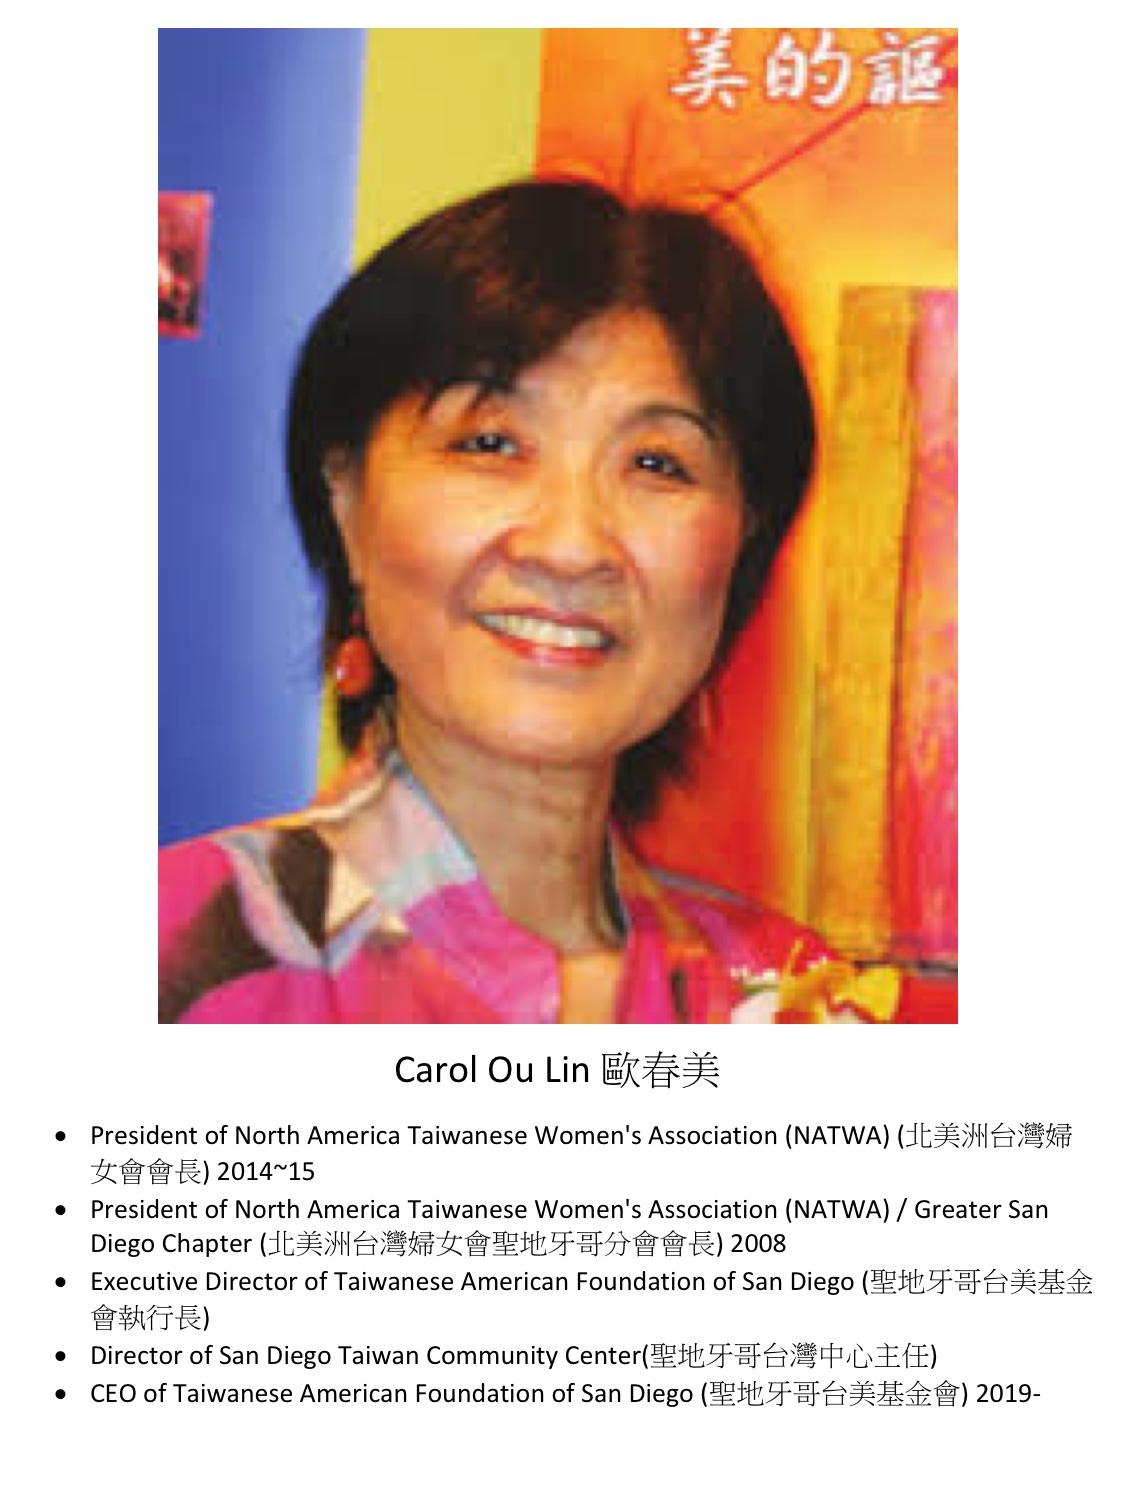 129.  Carol Ou Lin 歐春美